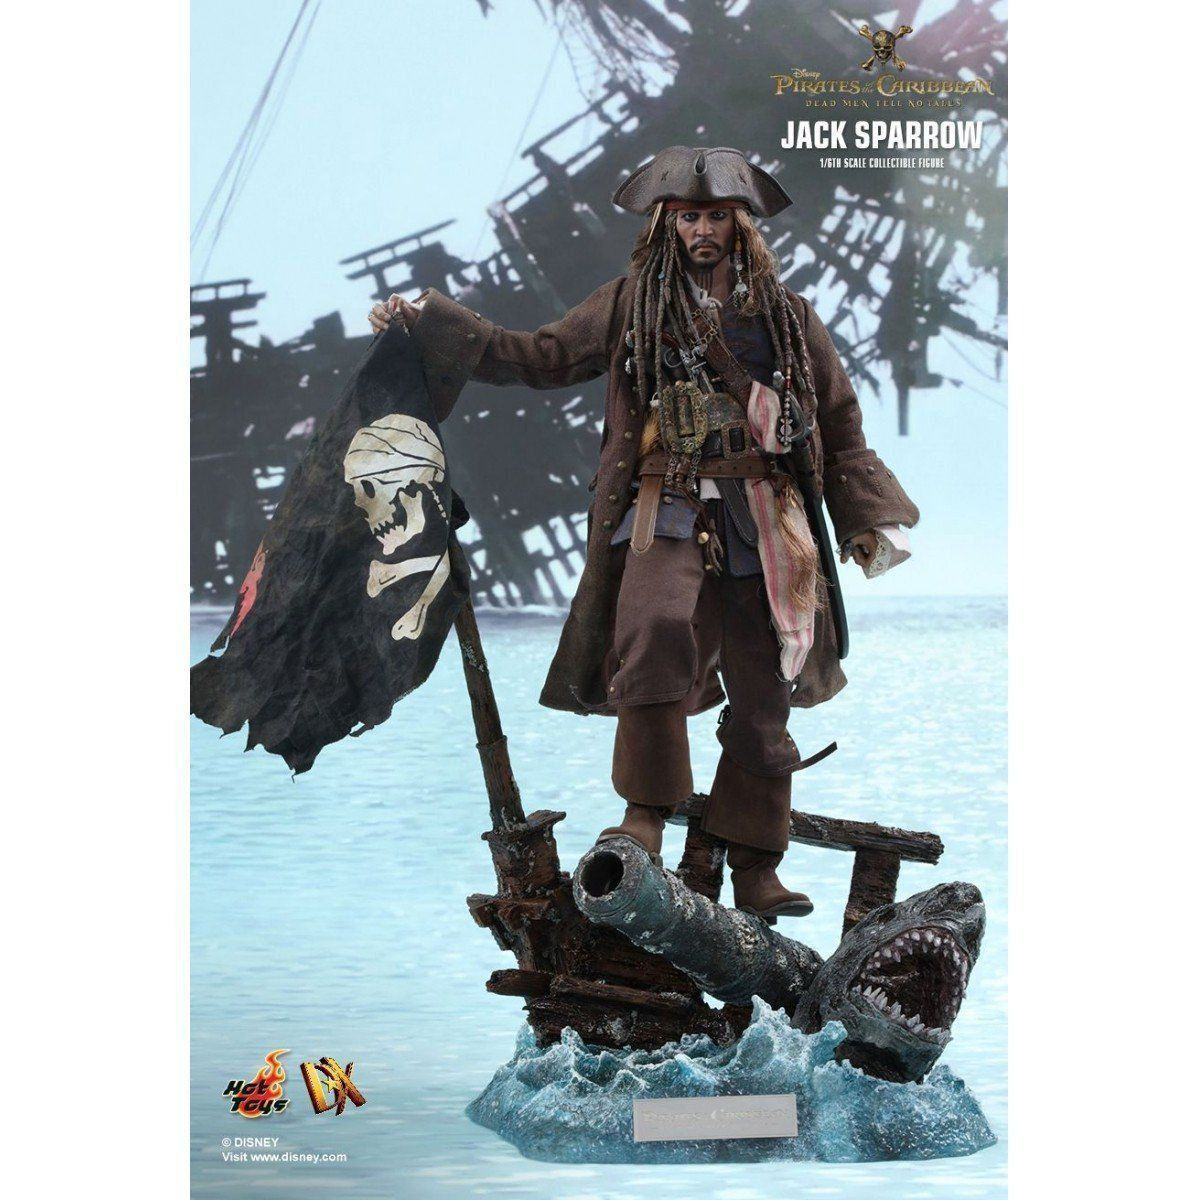 Action Figure Jack Sparrow: Piratas do Caribe A Vingança de Salazar (Dead Men Tell No Tales) Escala 1/6 (DX15) - Hot Toys